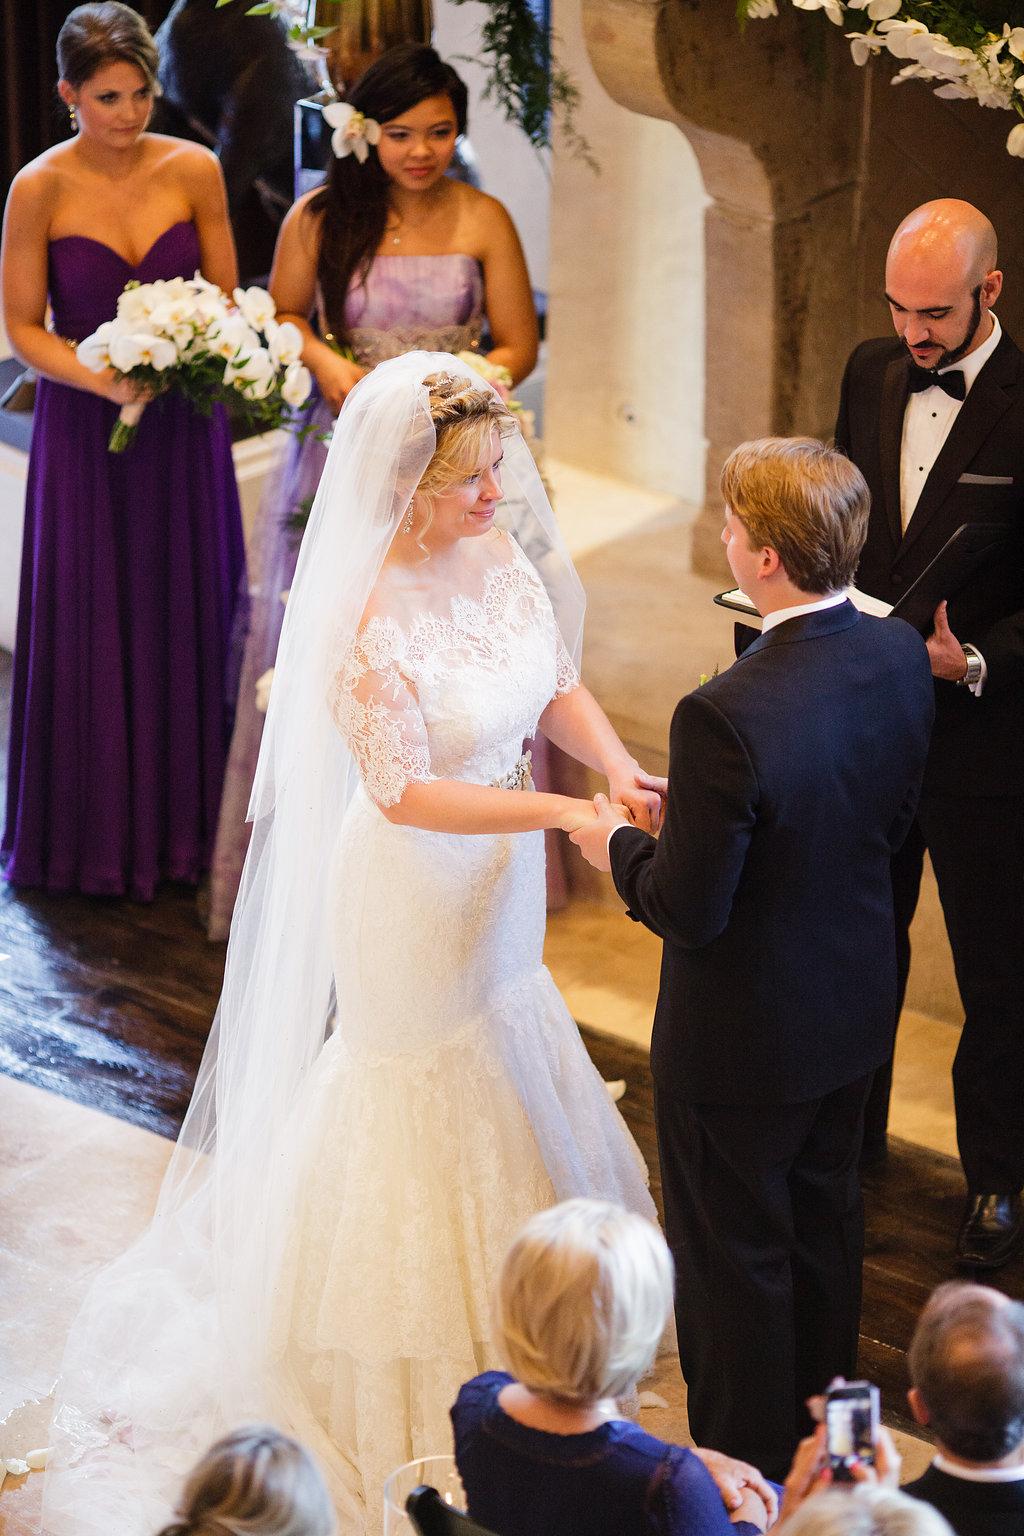 waldorf-astoria-wedding-photography-12.jpg